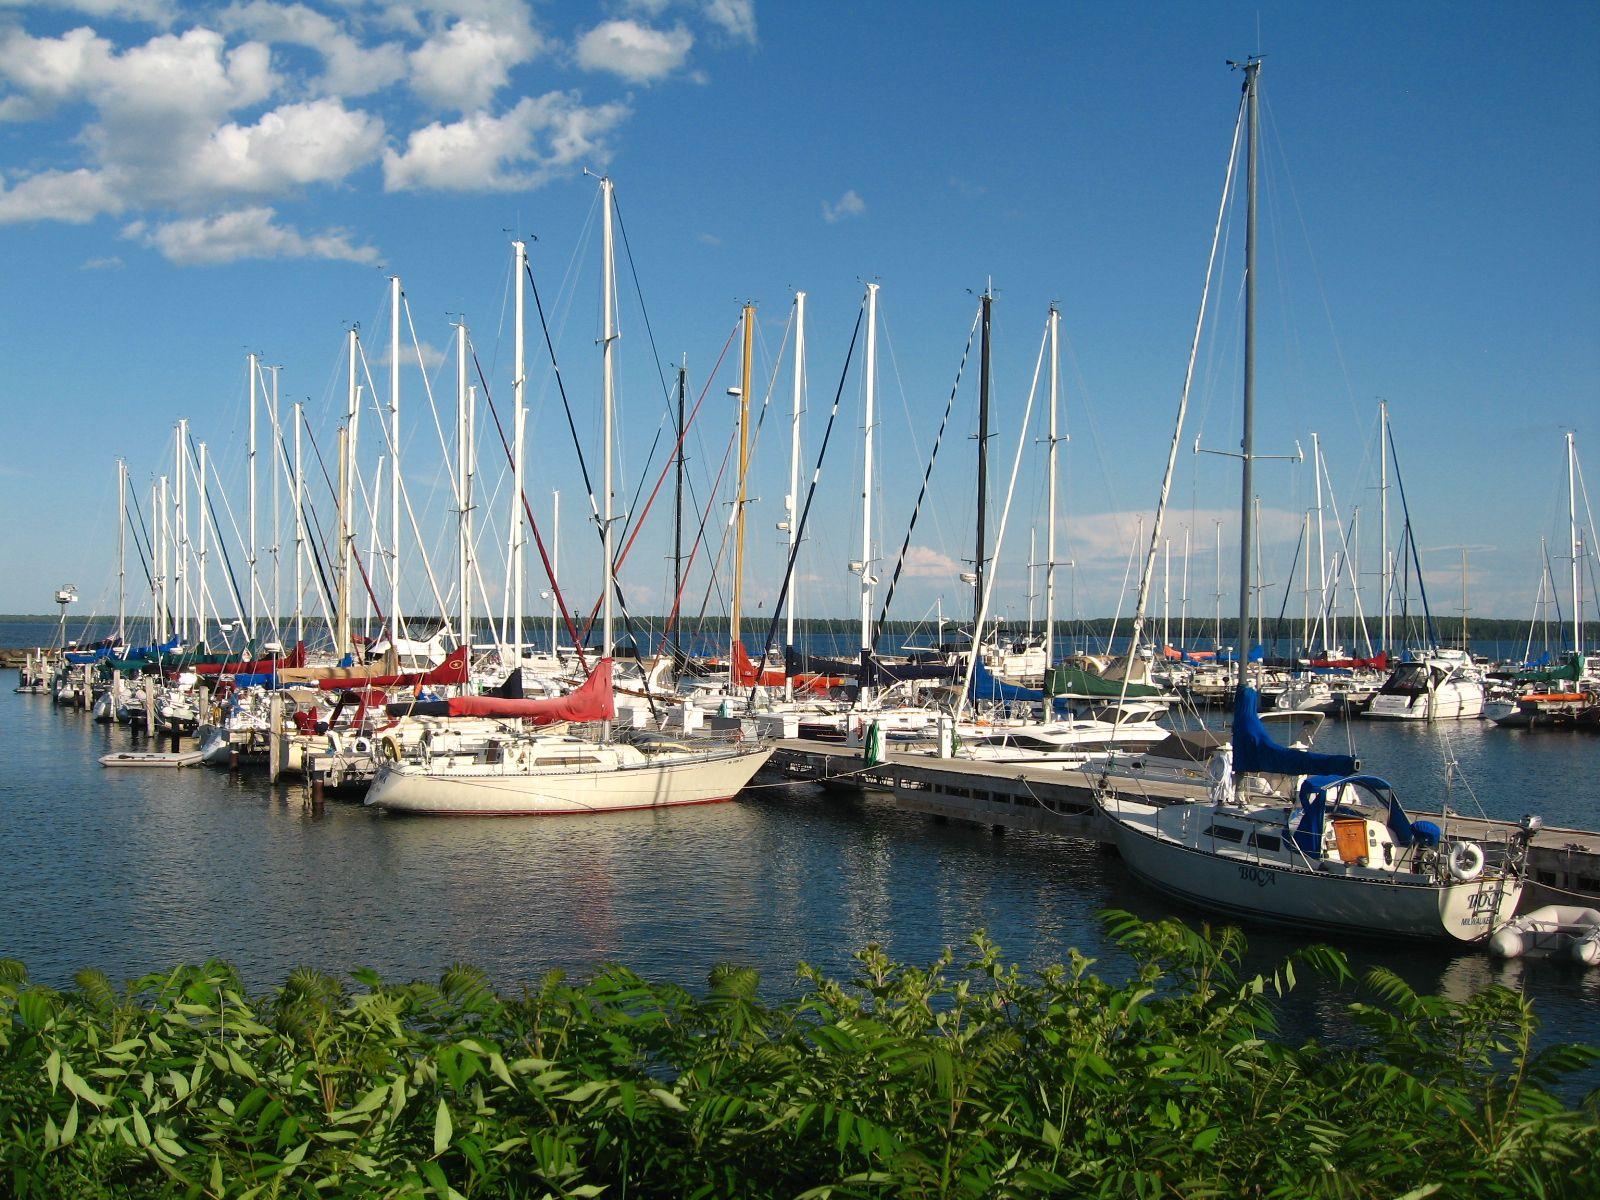 Marina - Bayfield Wisconsin.